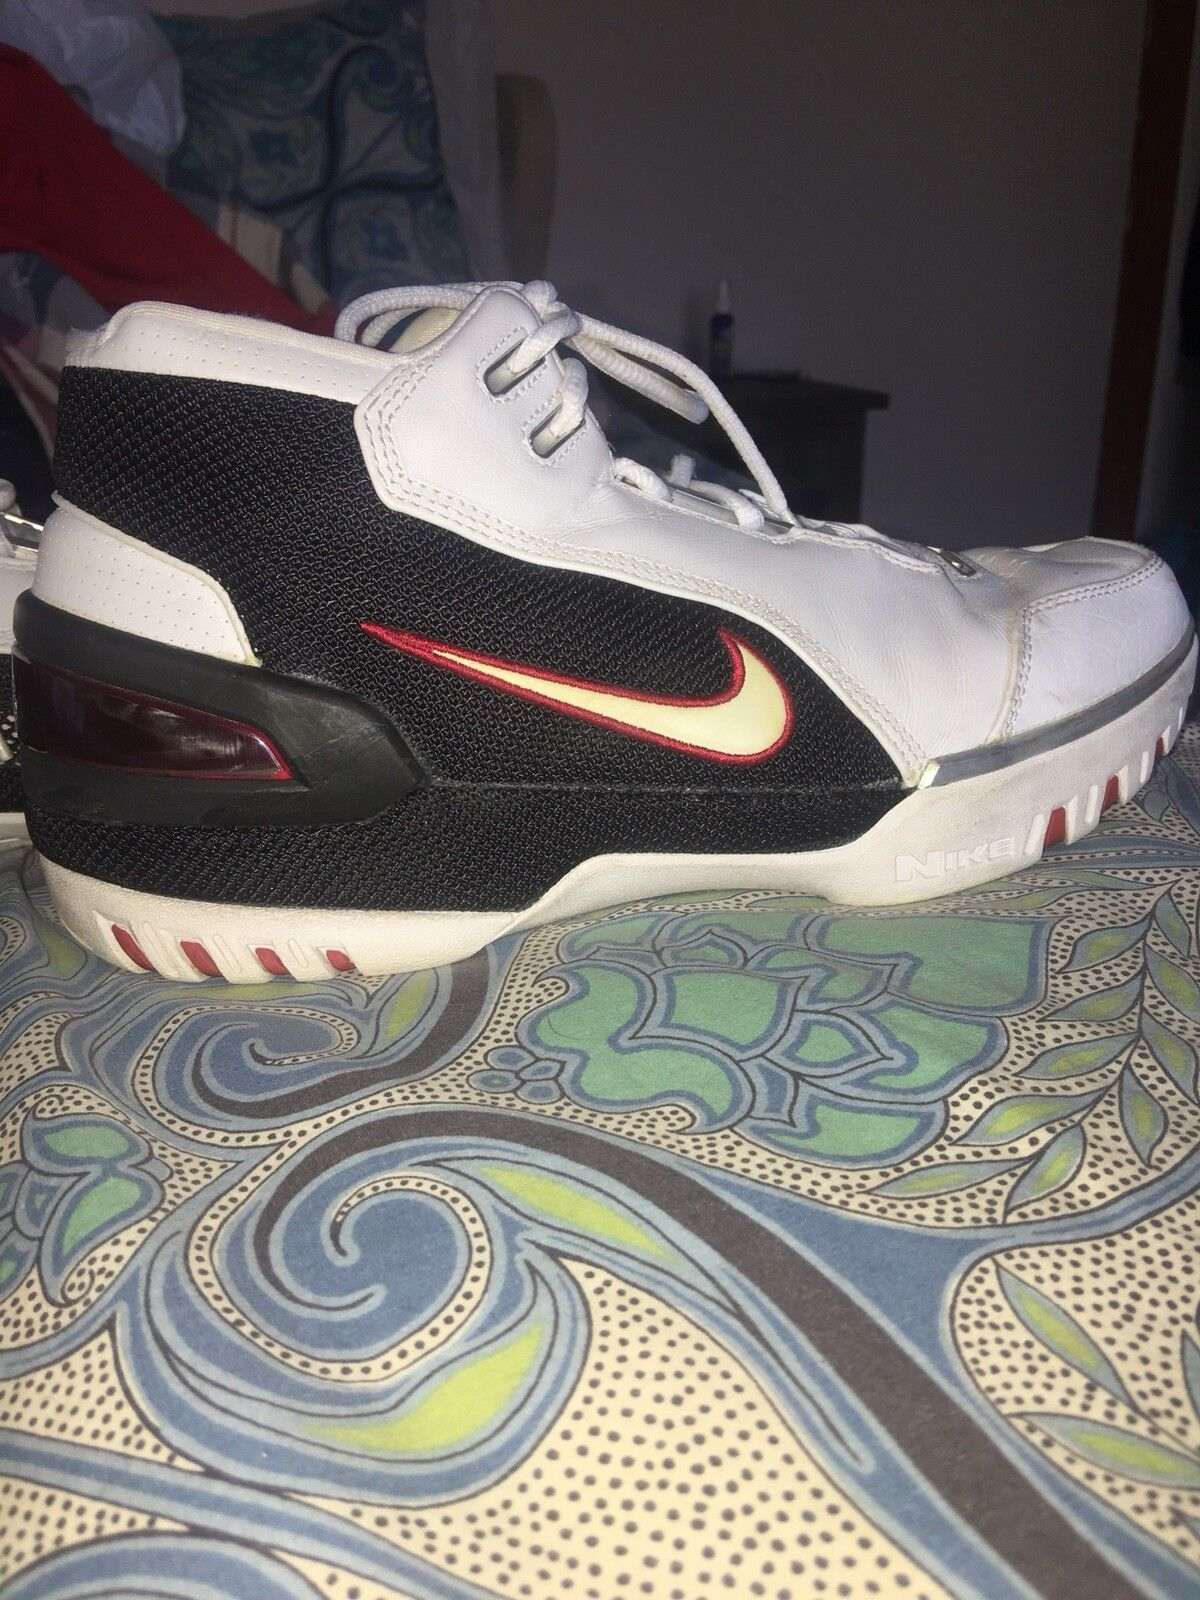 Nike lebron air zoom generation  AZG OG White Size 9.5 original 2003 release